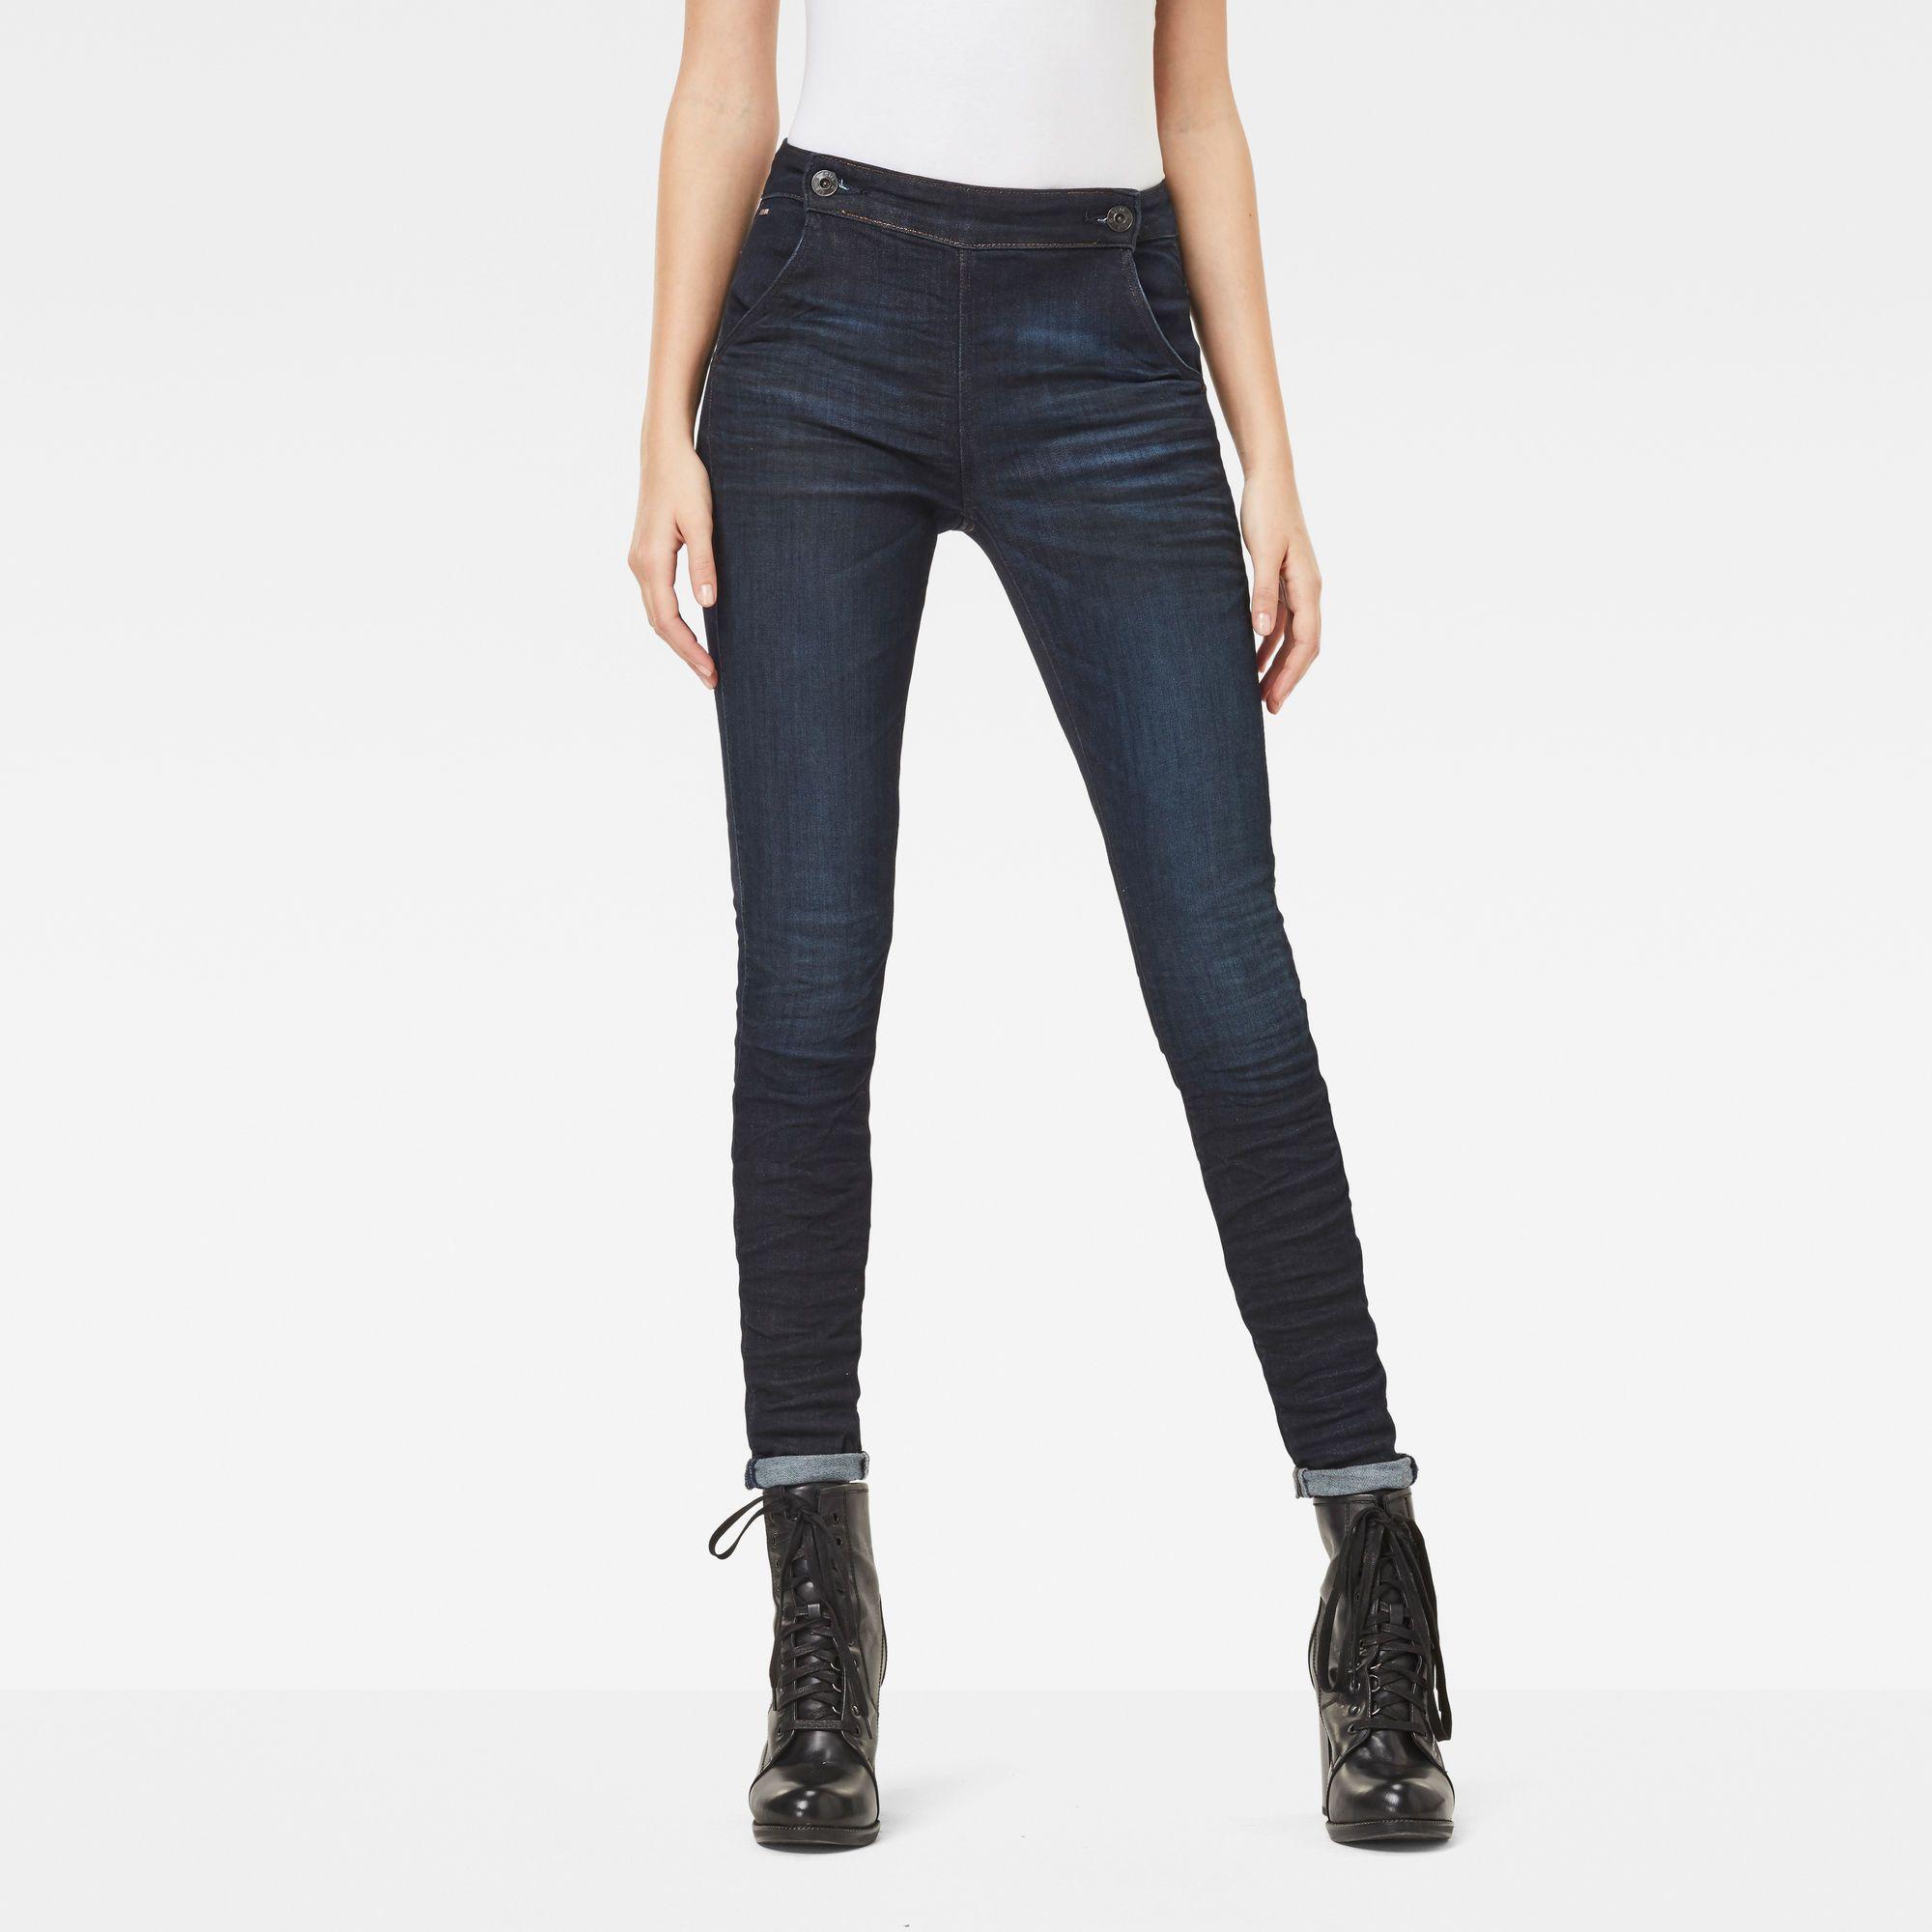 G-Star RAW 5622 Navy High Waist Skinny Jeans